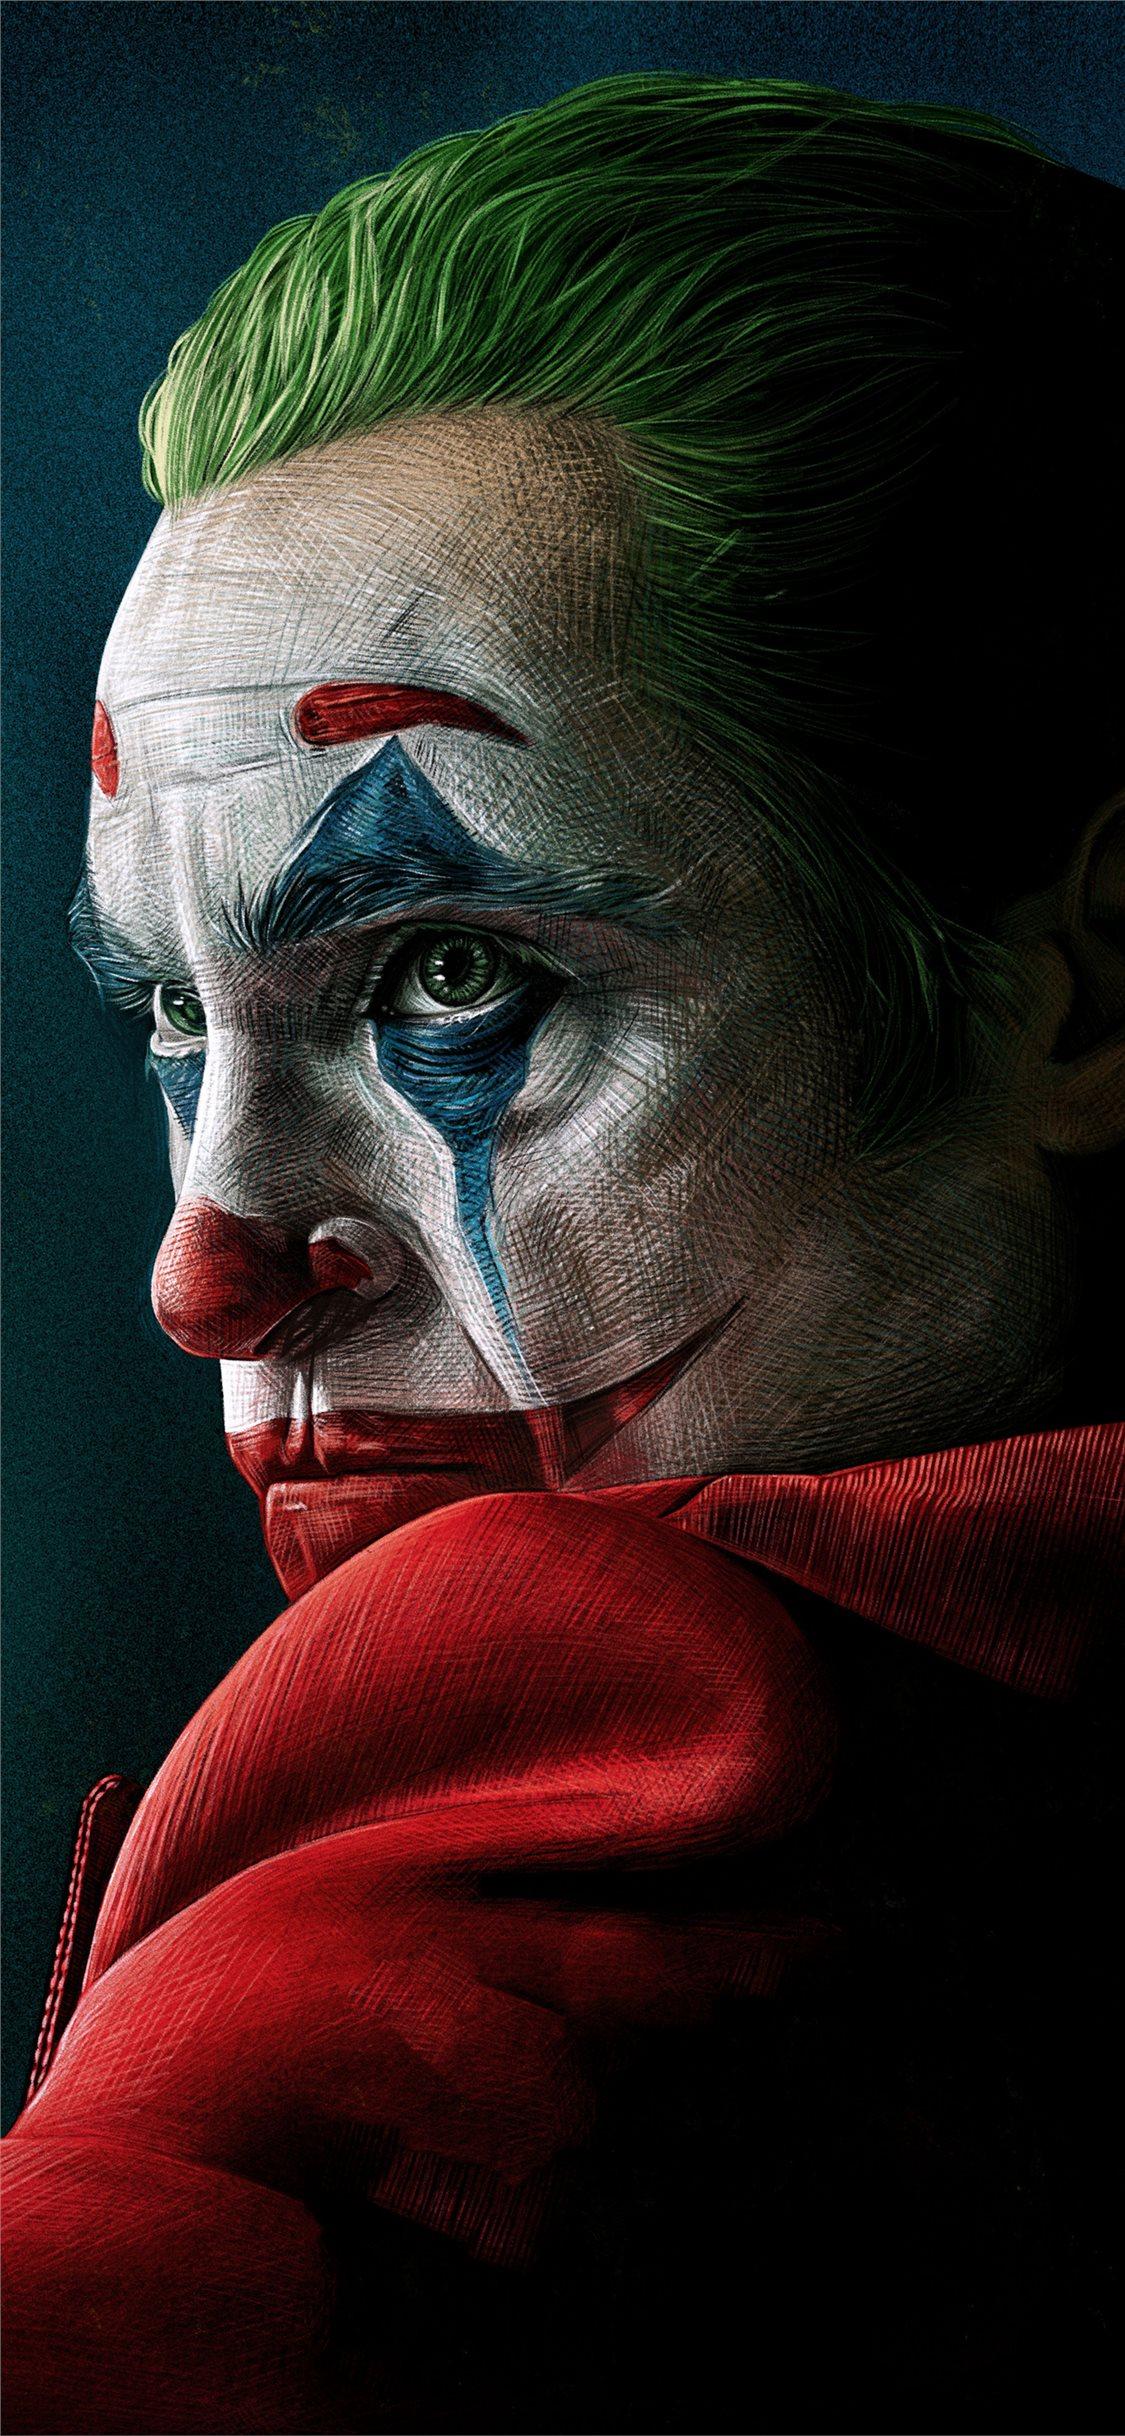 Joker Movie 4k Artwork Iphone 11 Wallpapers Free Download